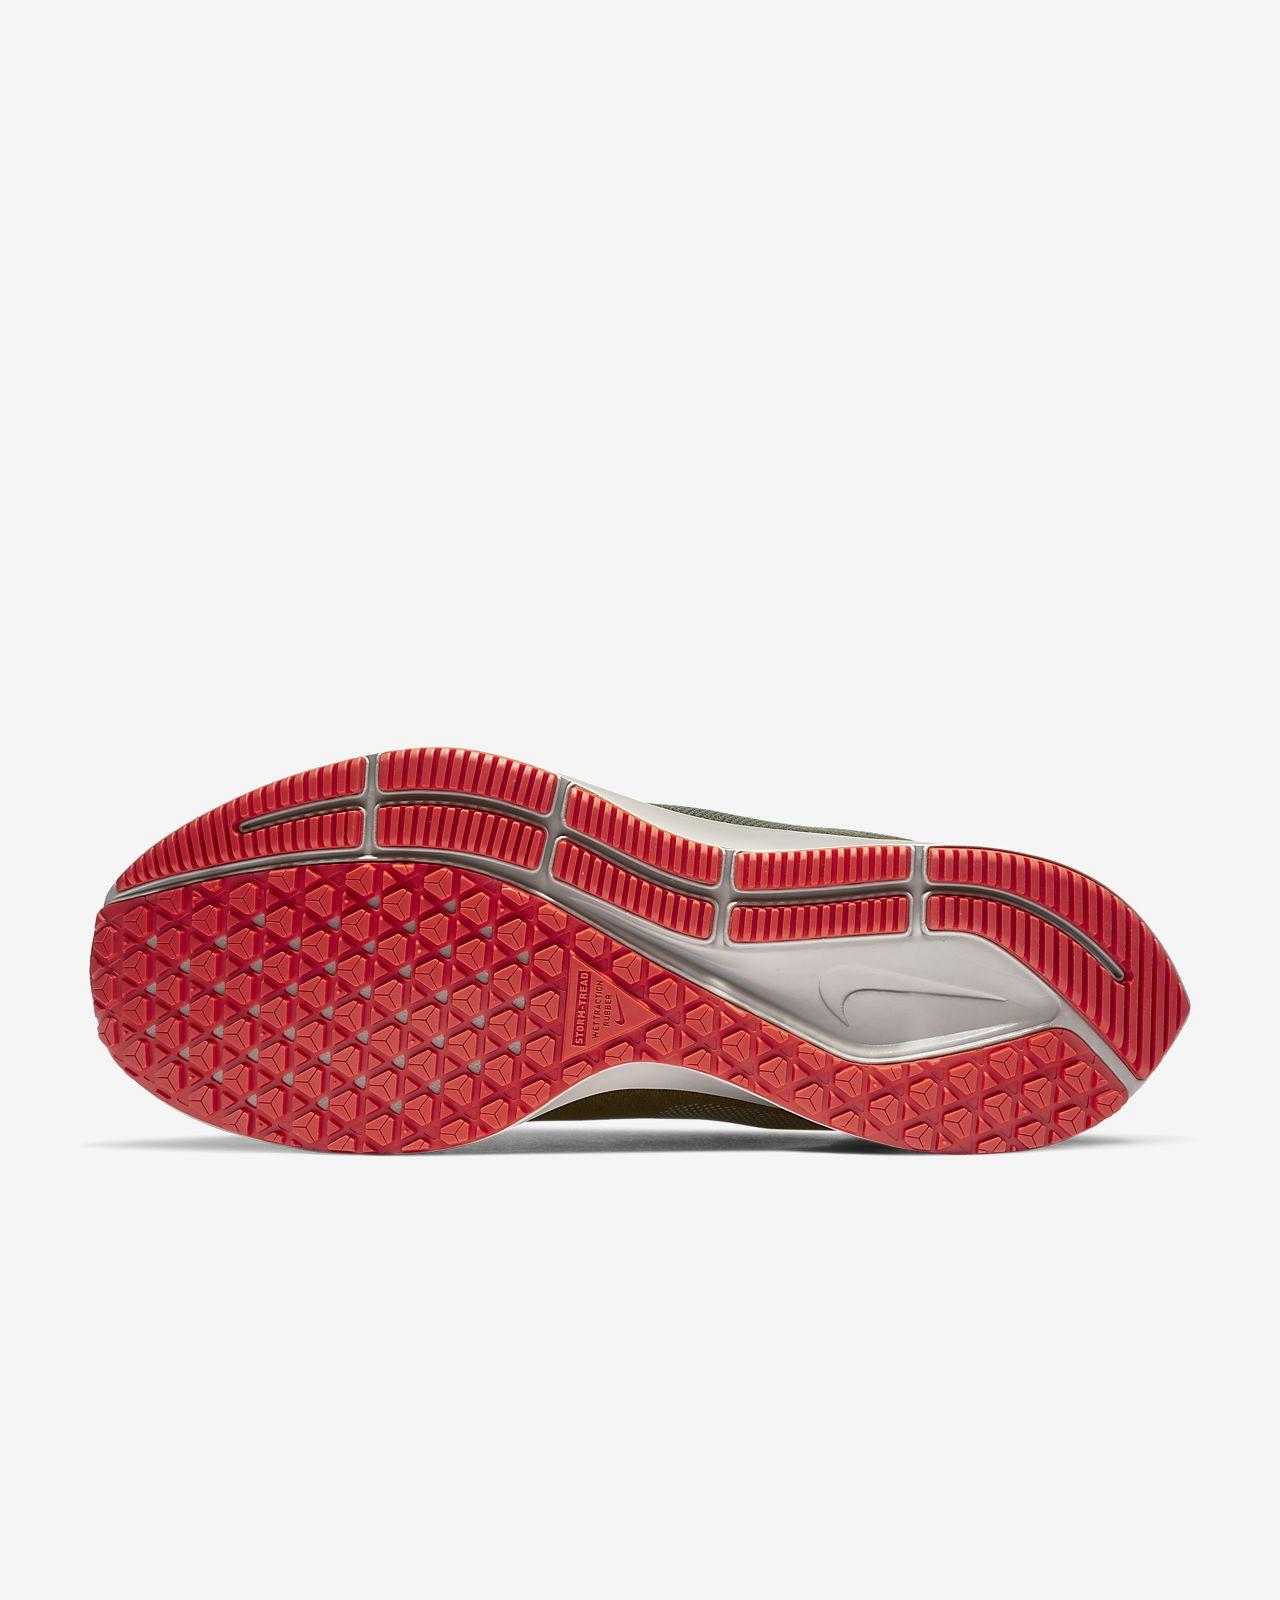 648749602da63e Nike Air Zoom Pegasus 35 Shield Olive Black Sail Aa1643 300 Nike